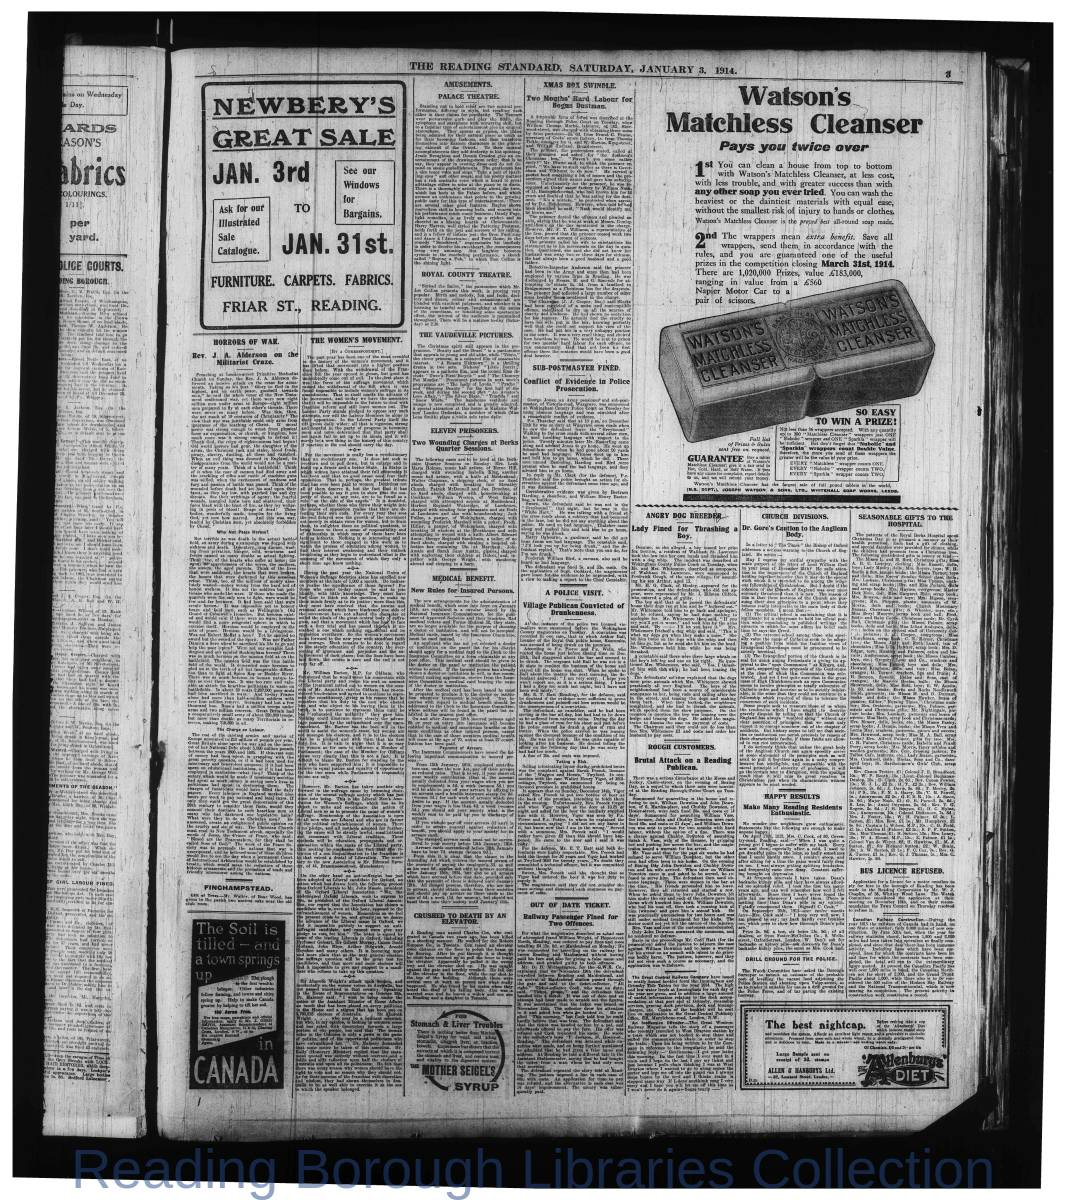 Reading Standard, Saturday, January 3, 1914. Pg 3